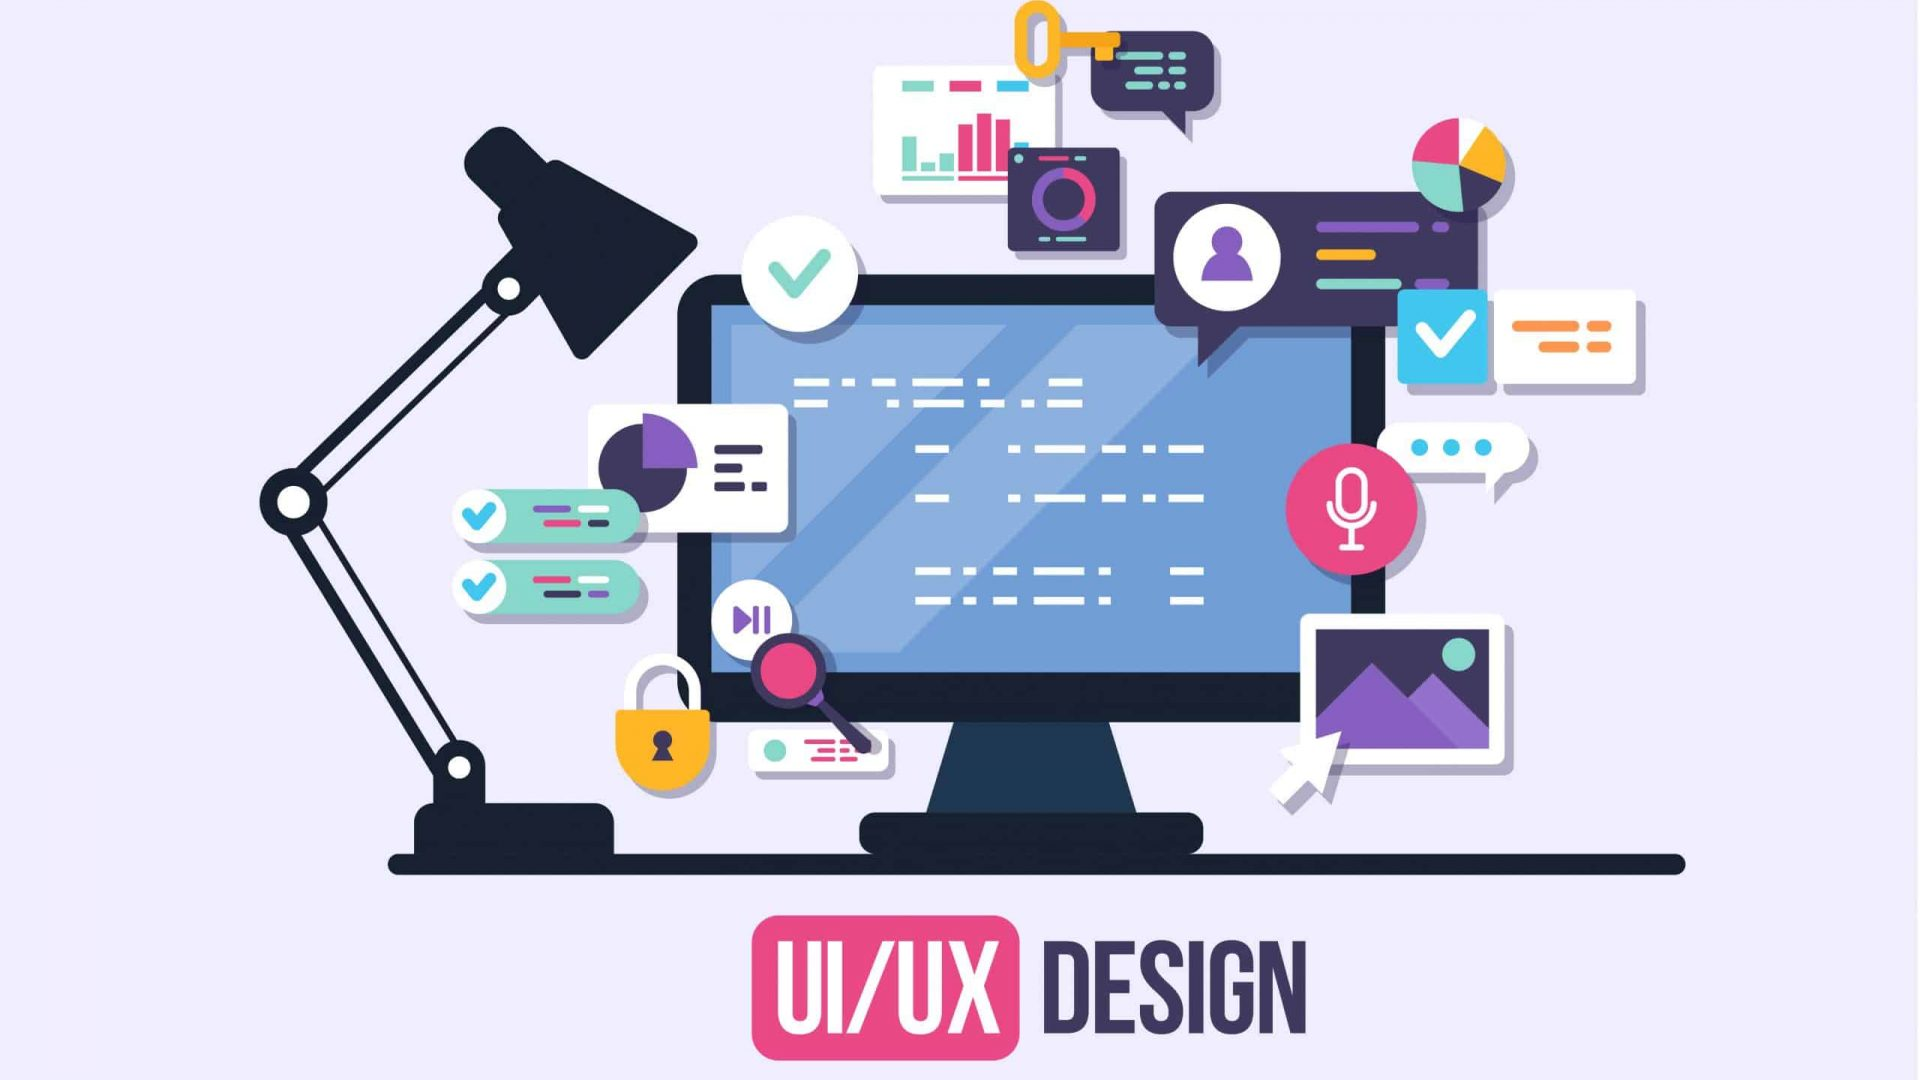 User Interface Design, Application development and UI, UX design. Creative vector illustration.